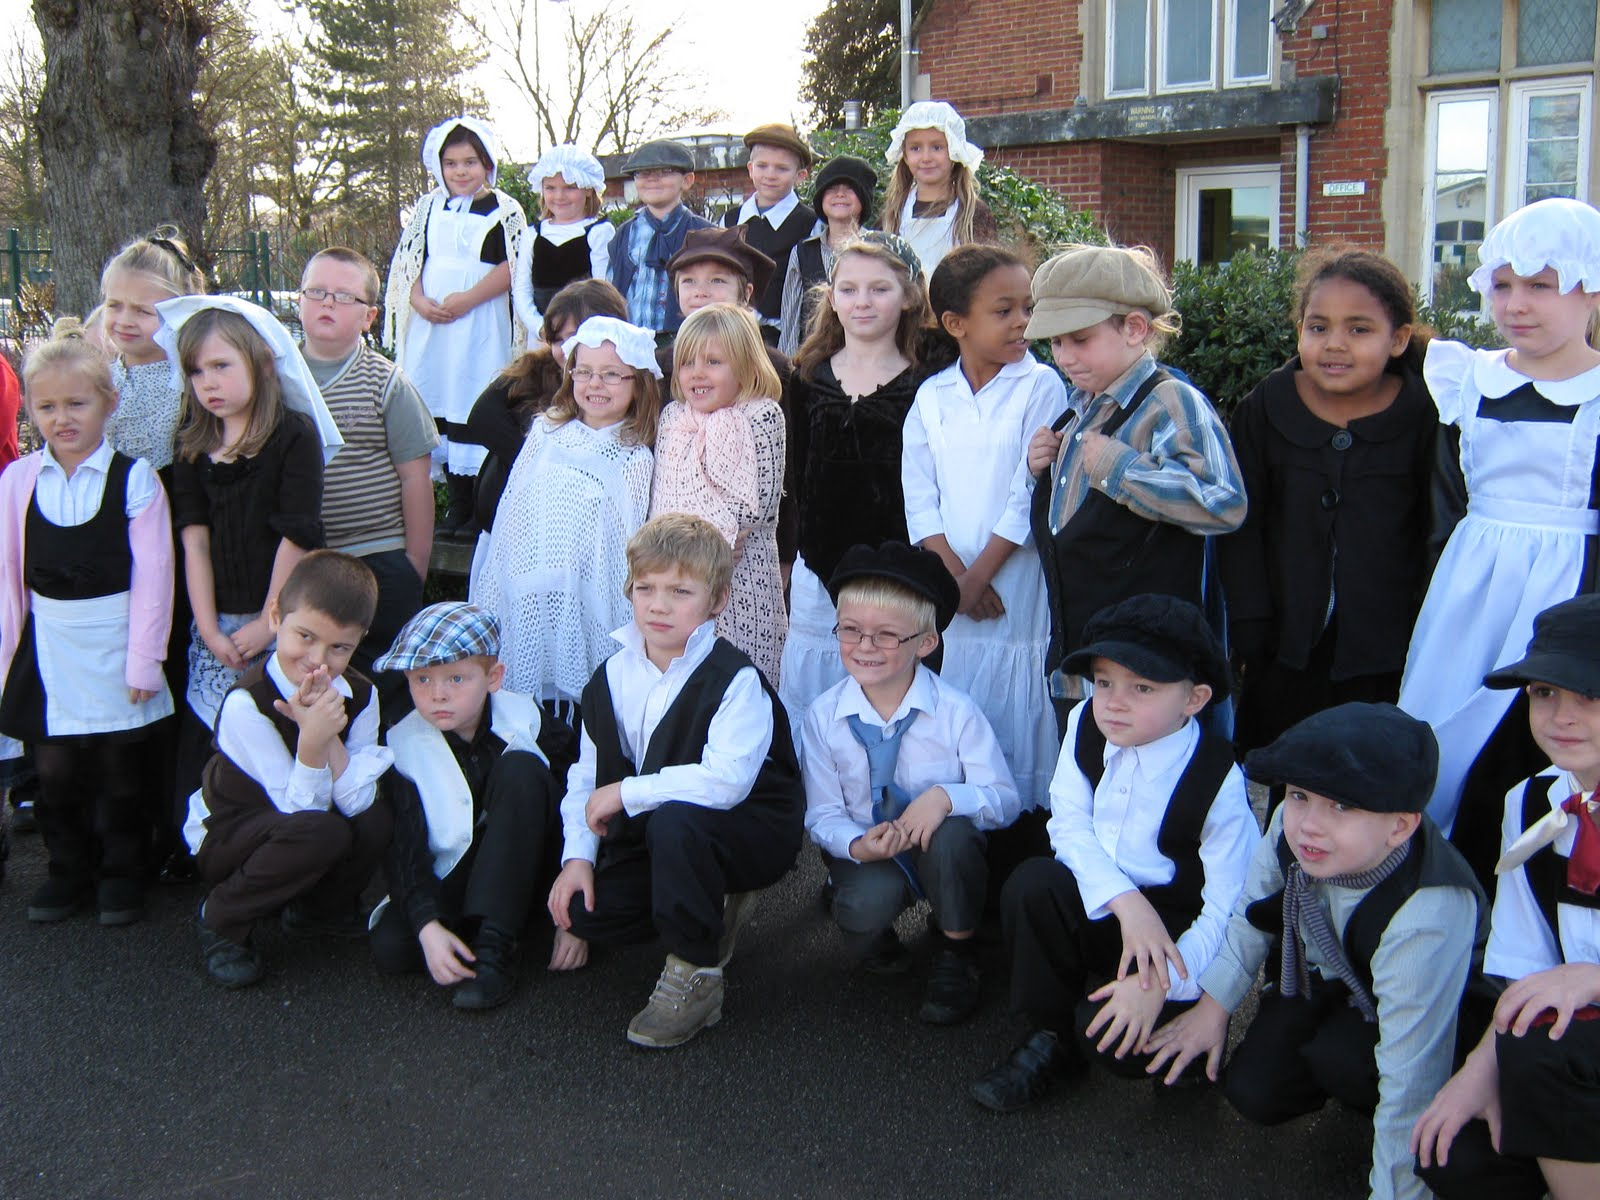 Victorian Day School